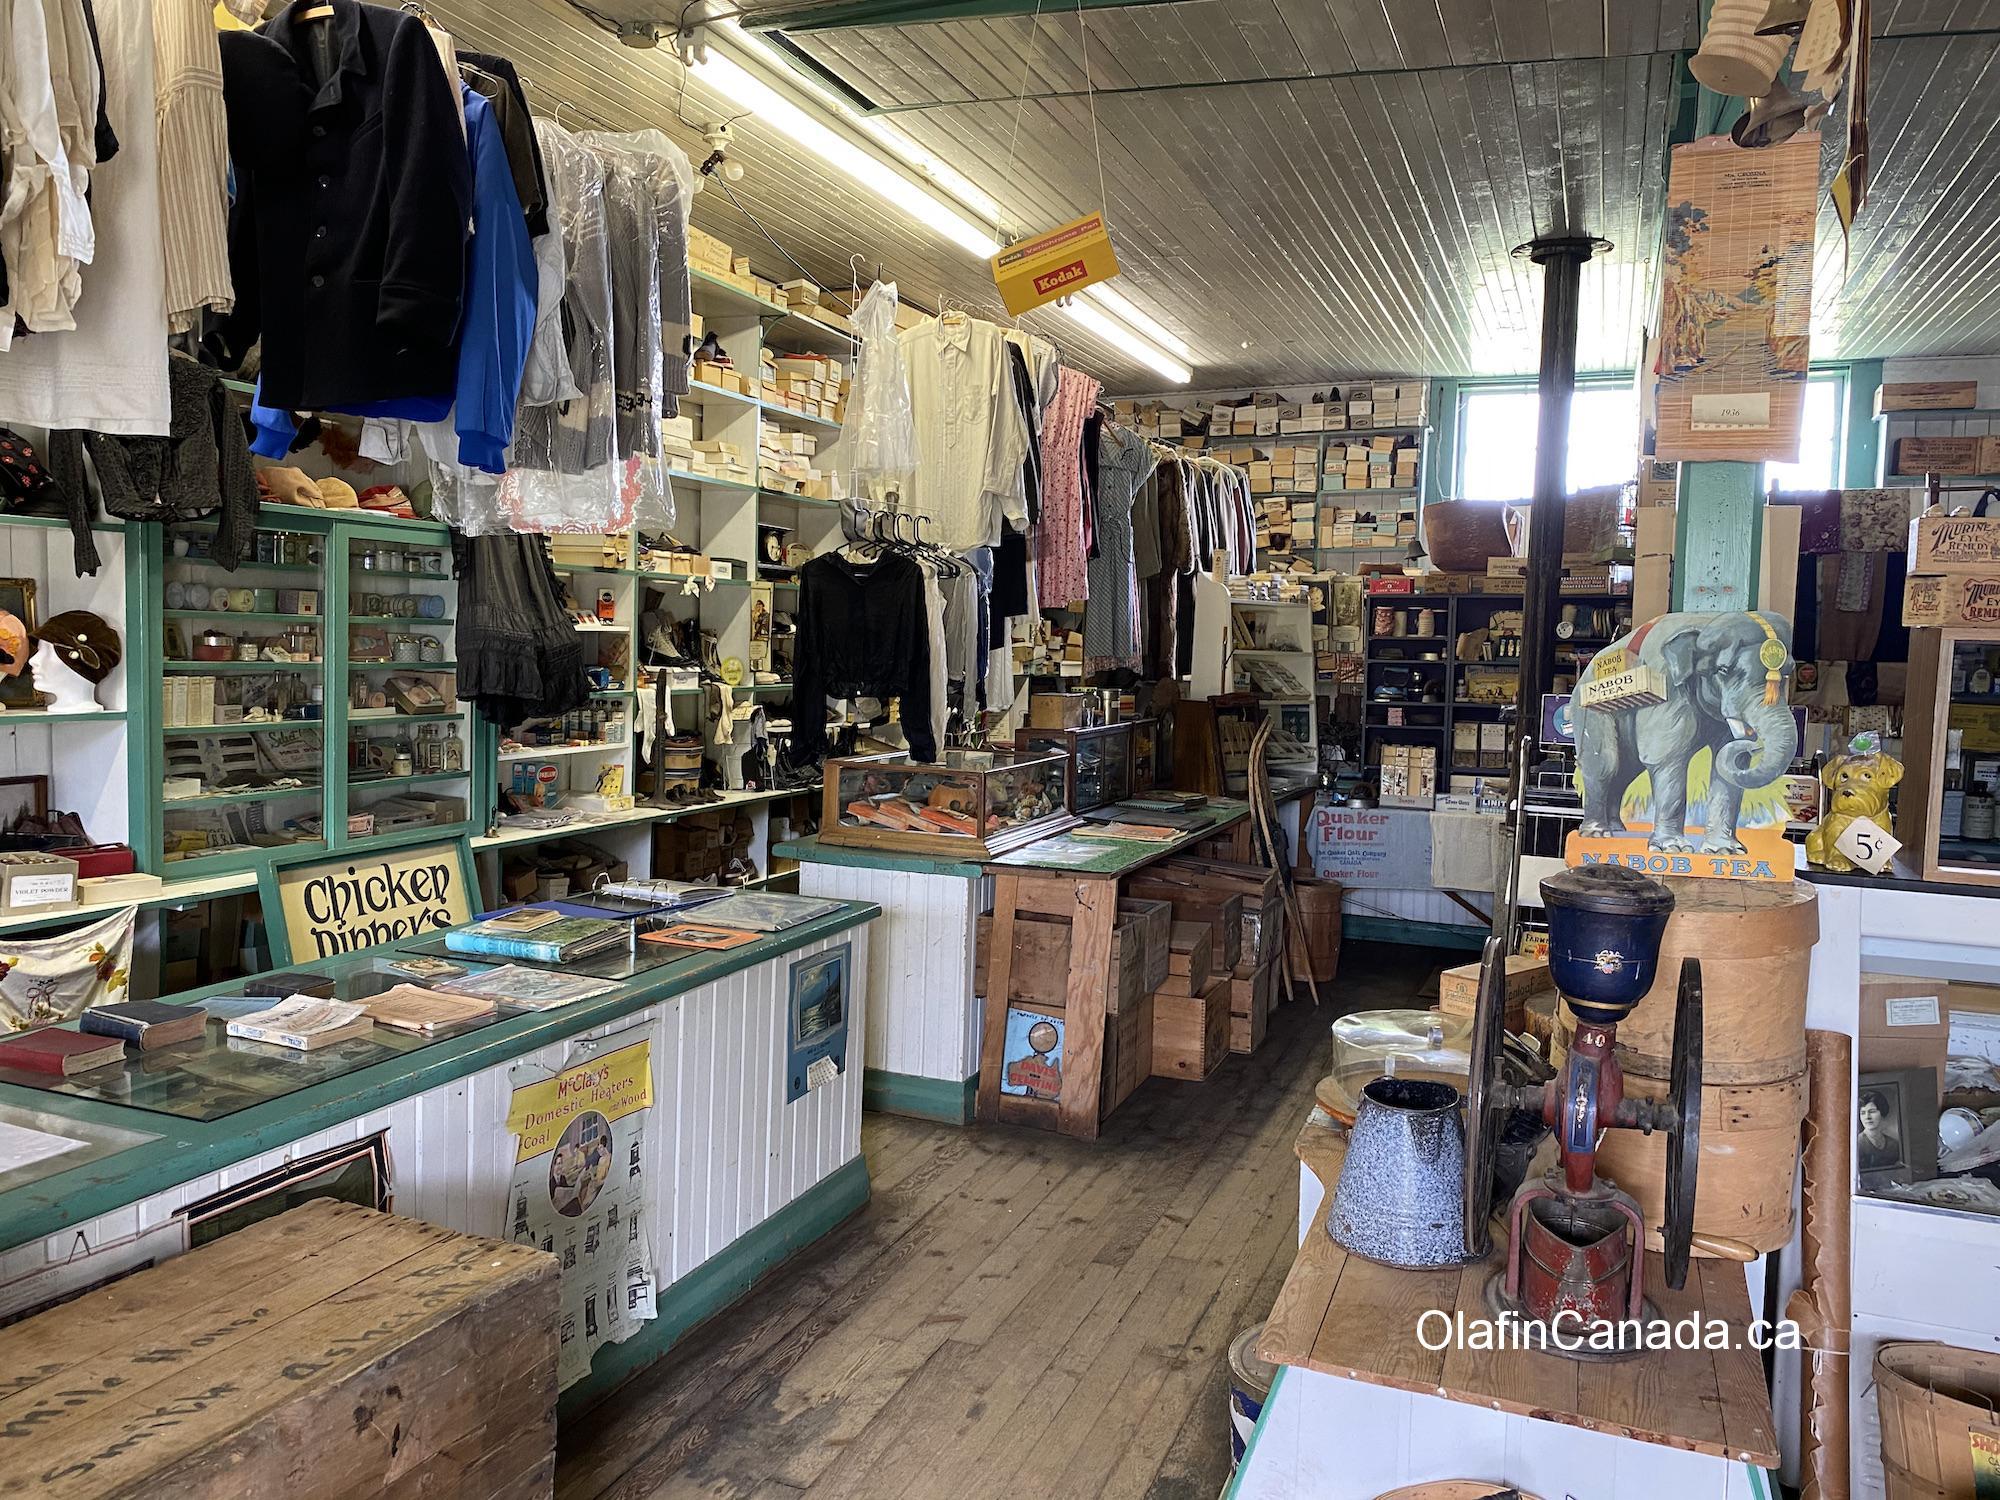 General Store in 153 Mile House #olafincanada #britishcolumbia #discoverbc #abandonedbc #153milehouse #generalstore #backintime